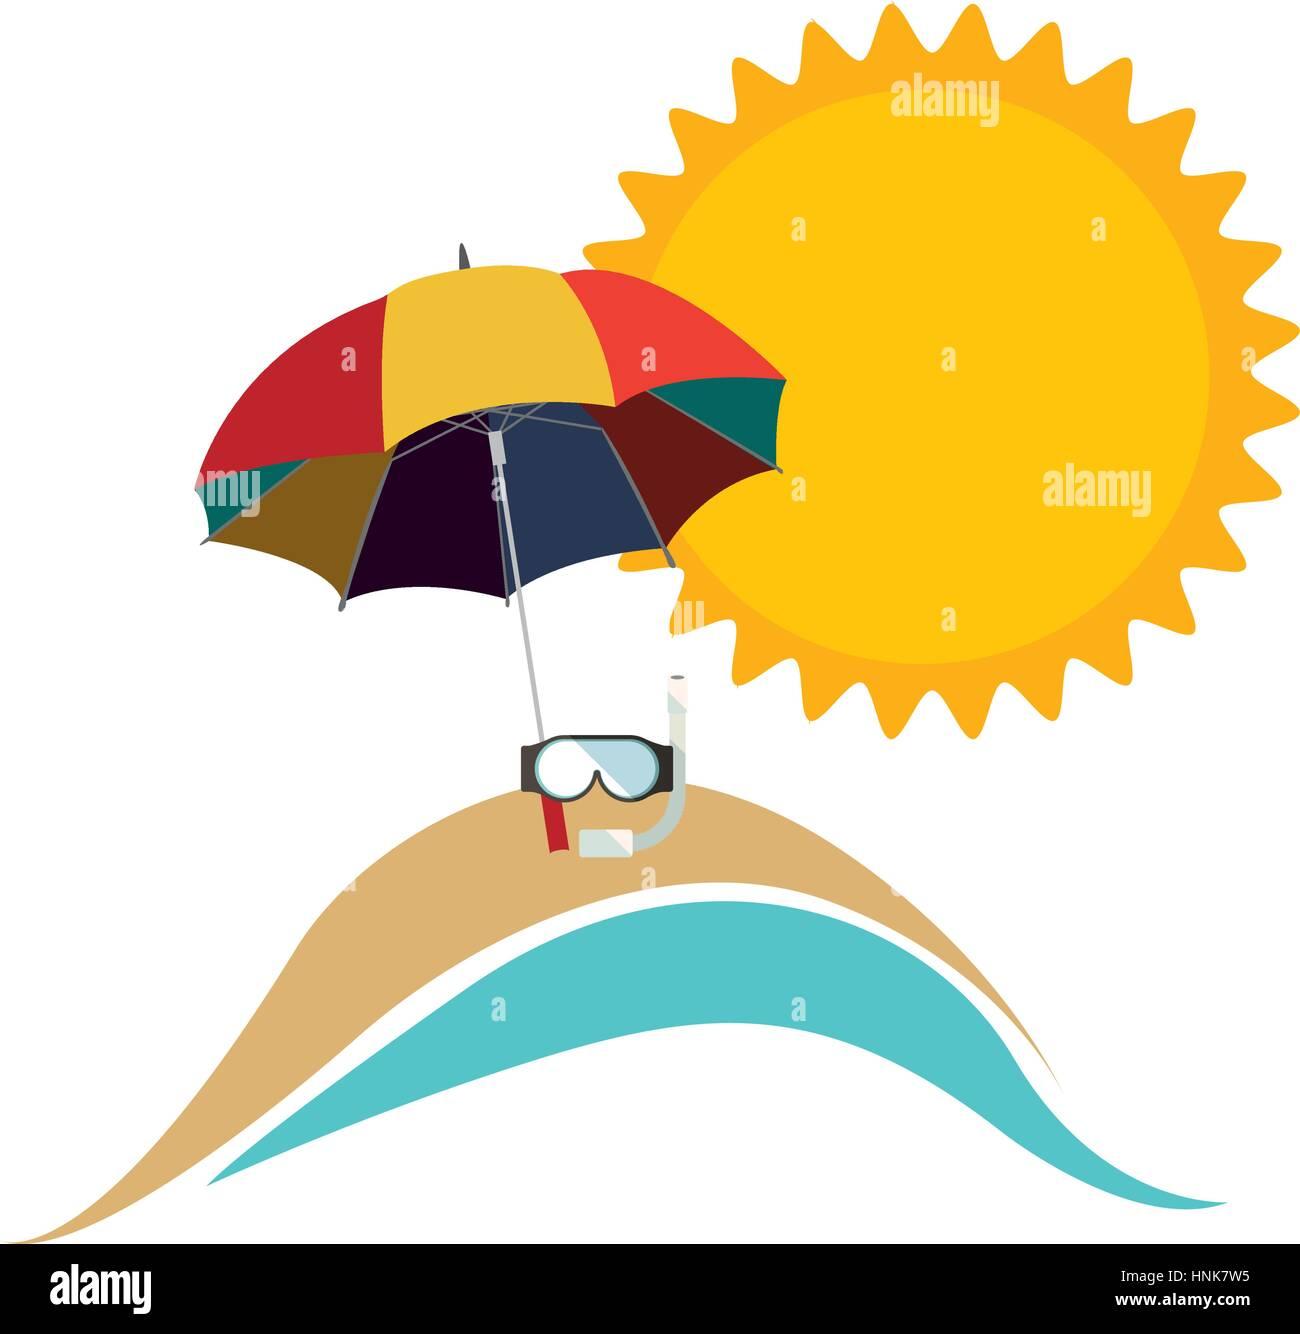 Sonnenschirm strand clipart  Symbol-Strand mit Sonnenschirm Symbolbild, Vektor-illustration ...